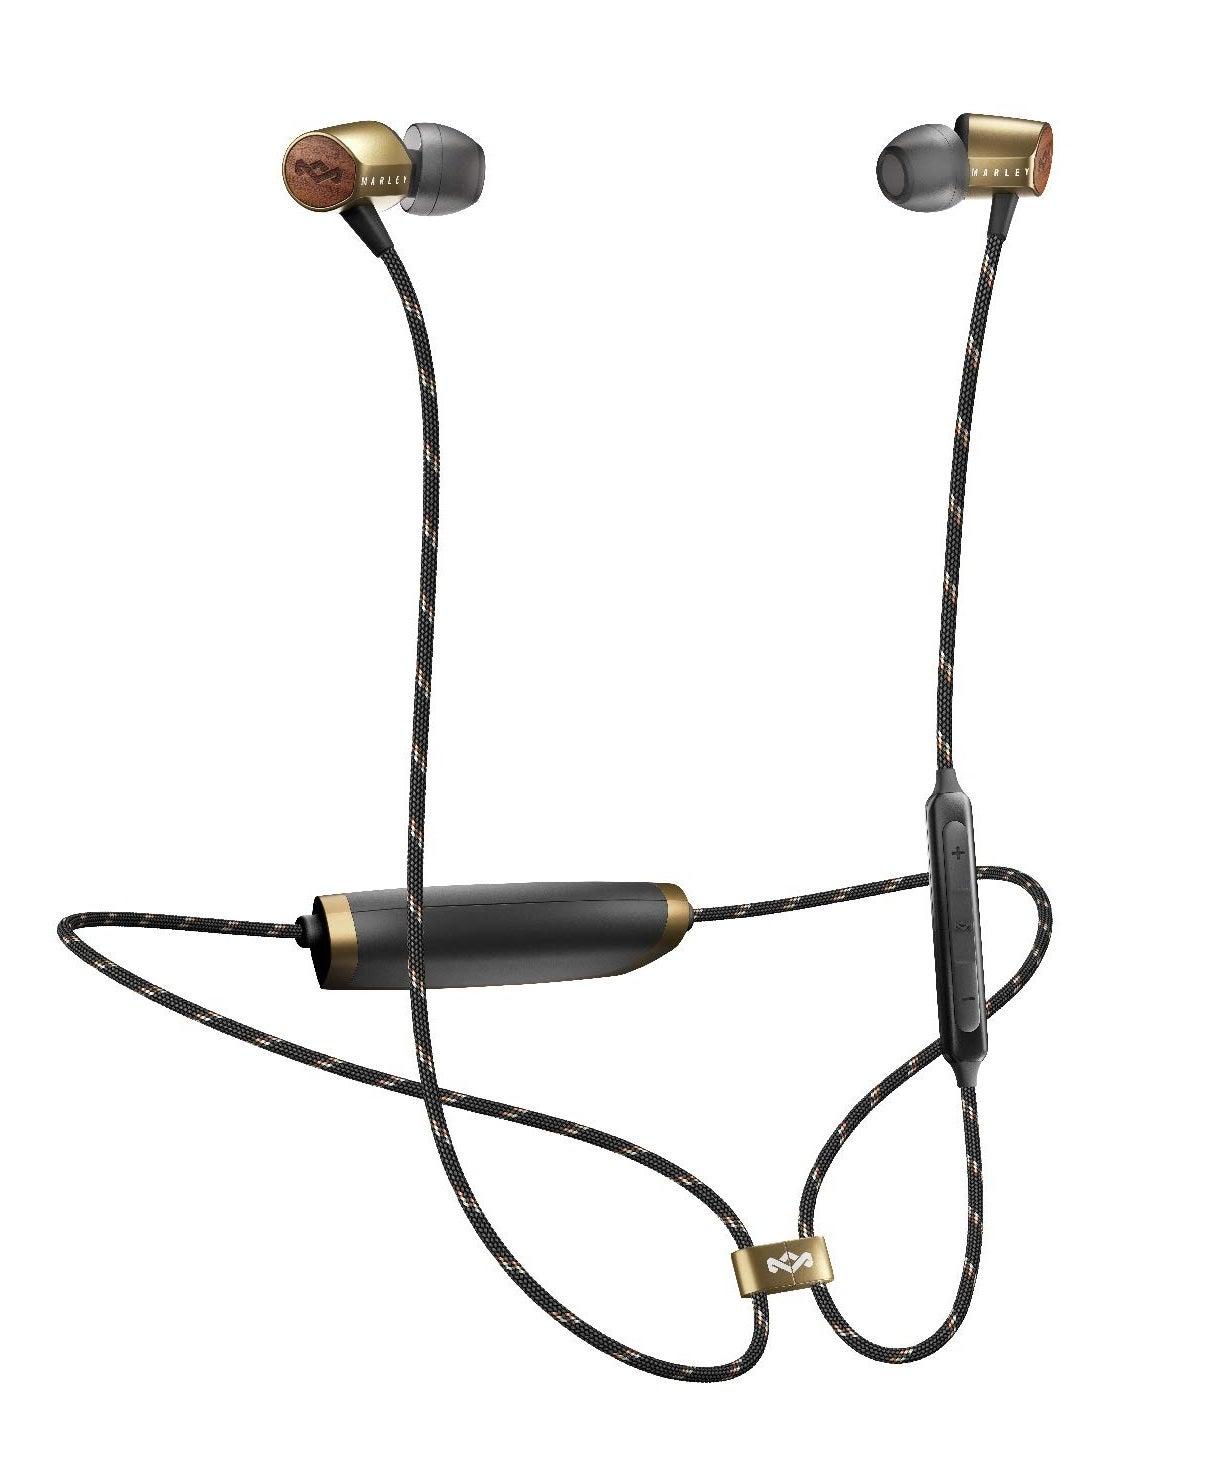 Marley Uplift 2 Wireless Headphones